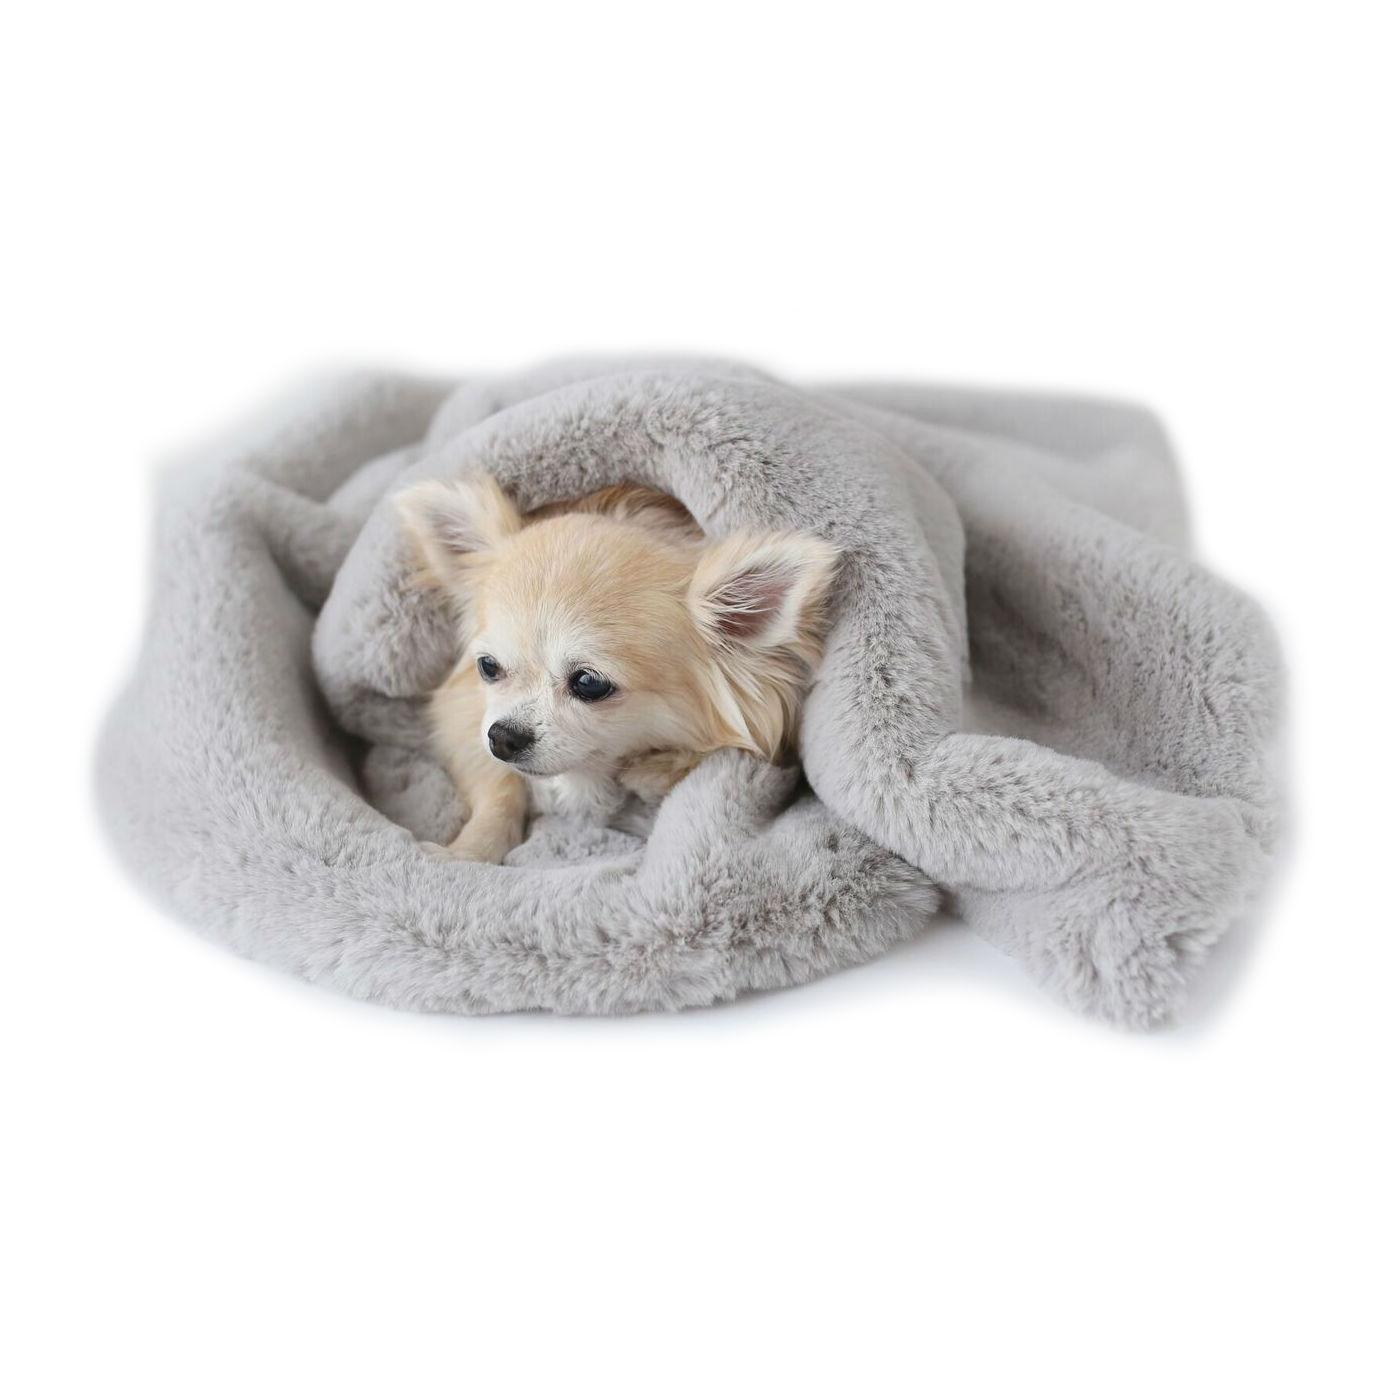 Divine Dog Blanket by Hello Doggie - Dove Gray